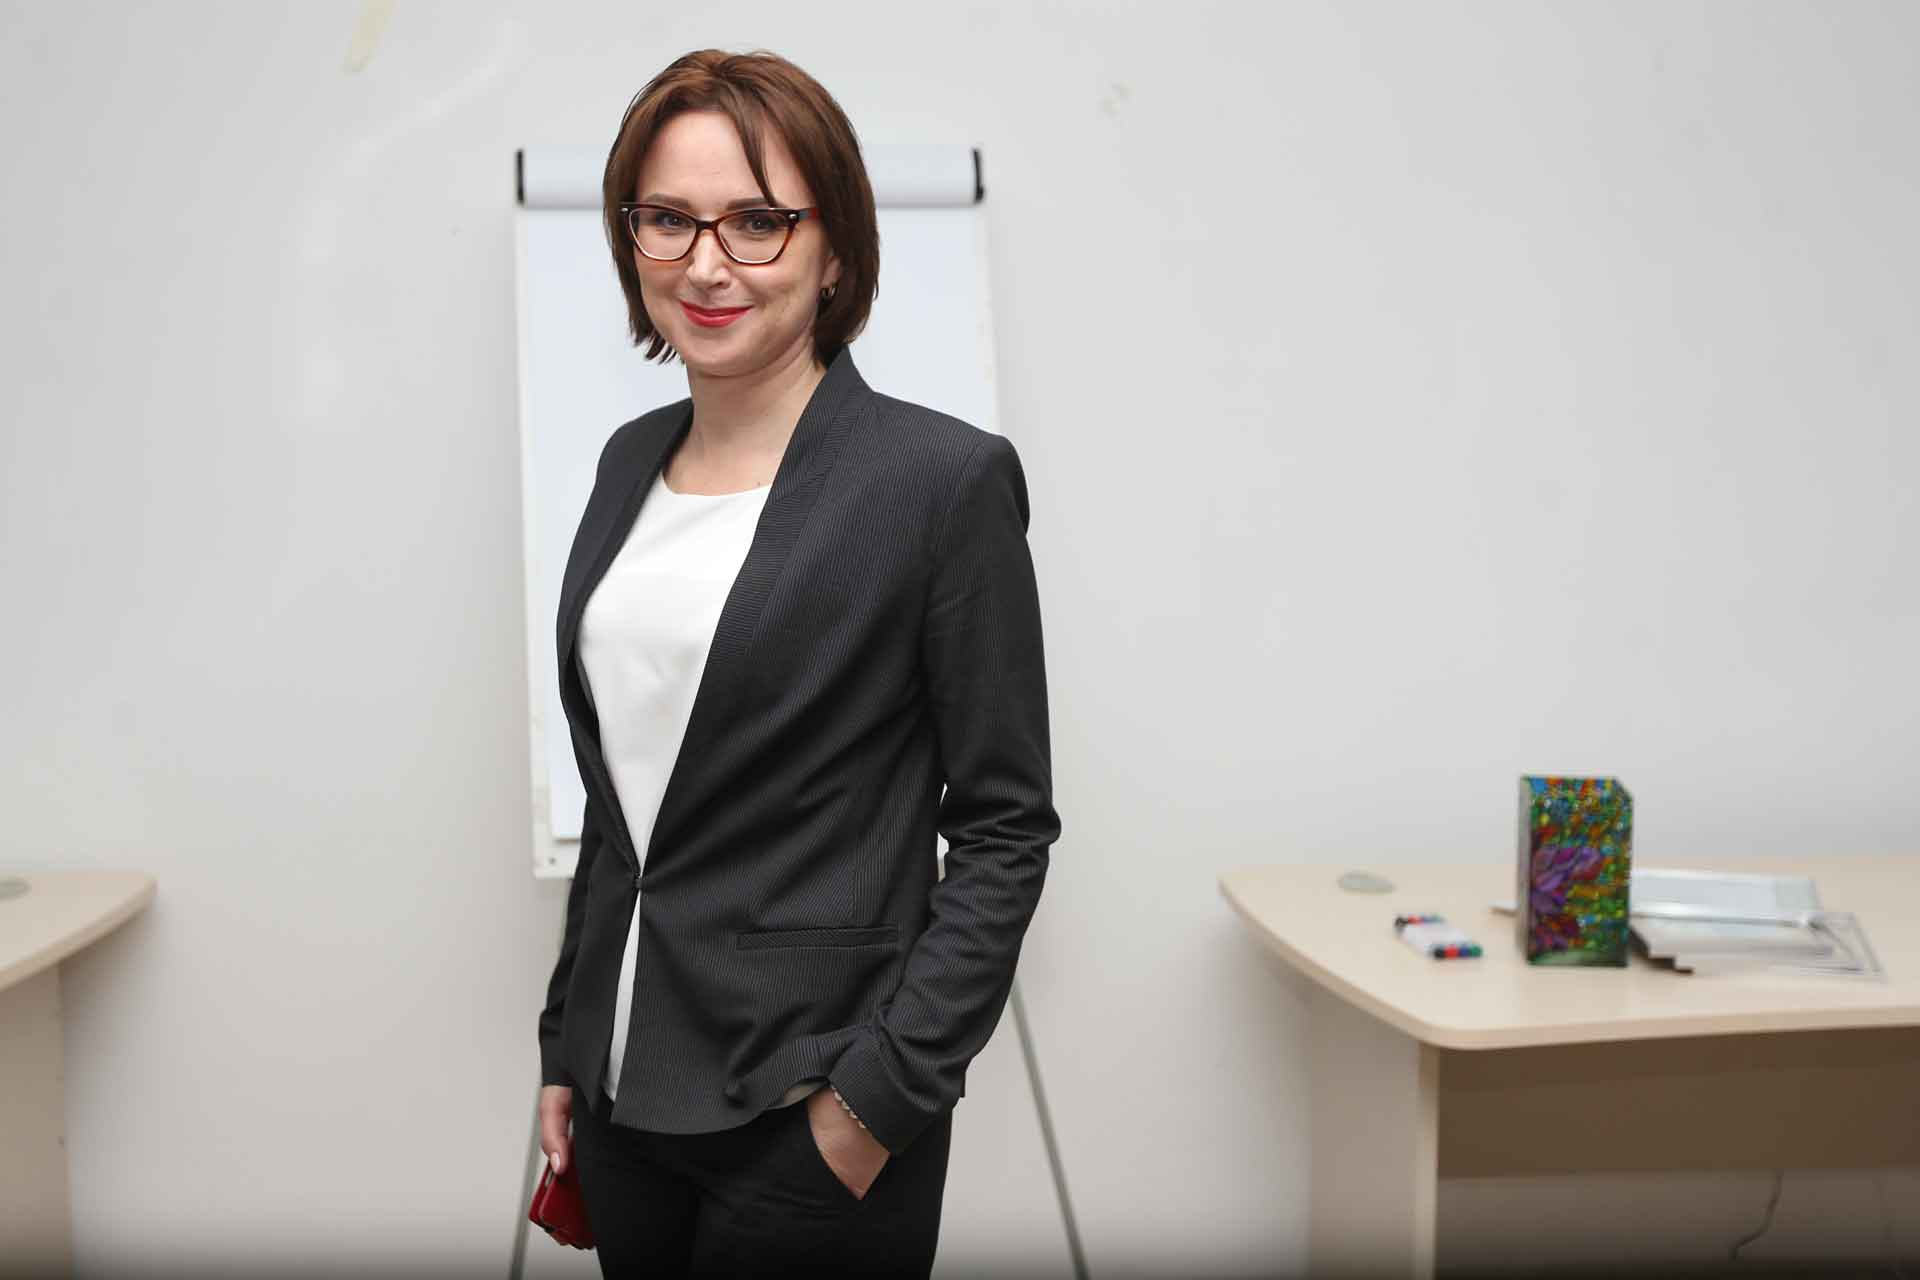 Спикер: Старостина Светлана. бизнес-коуч, бизнес-тренер